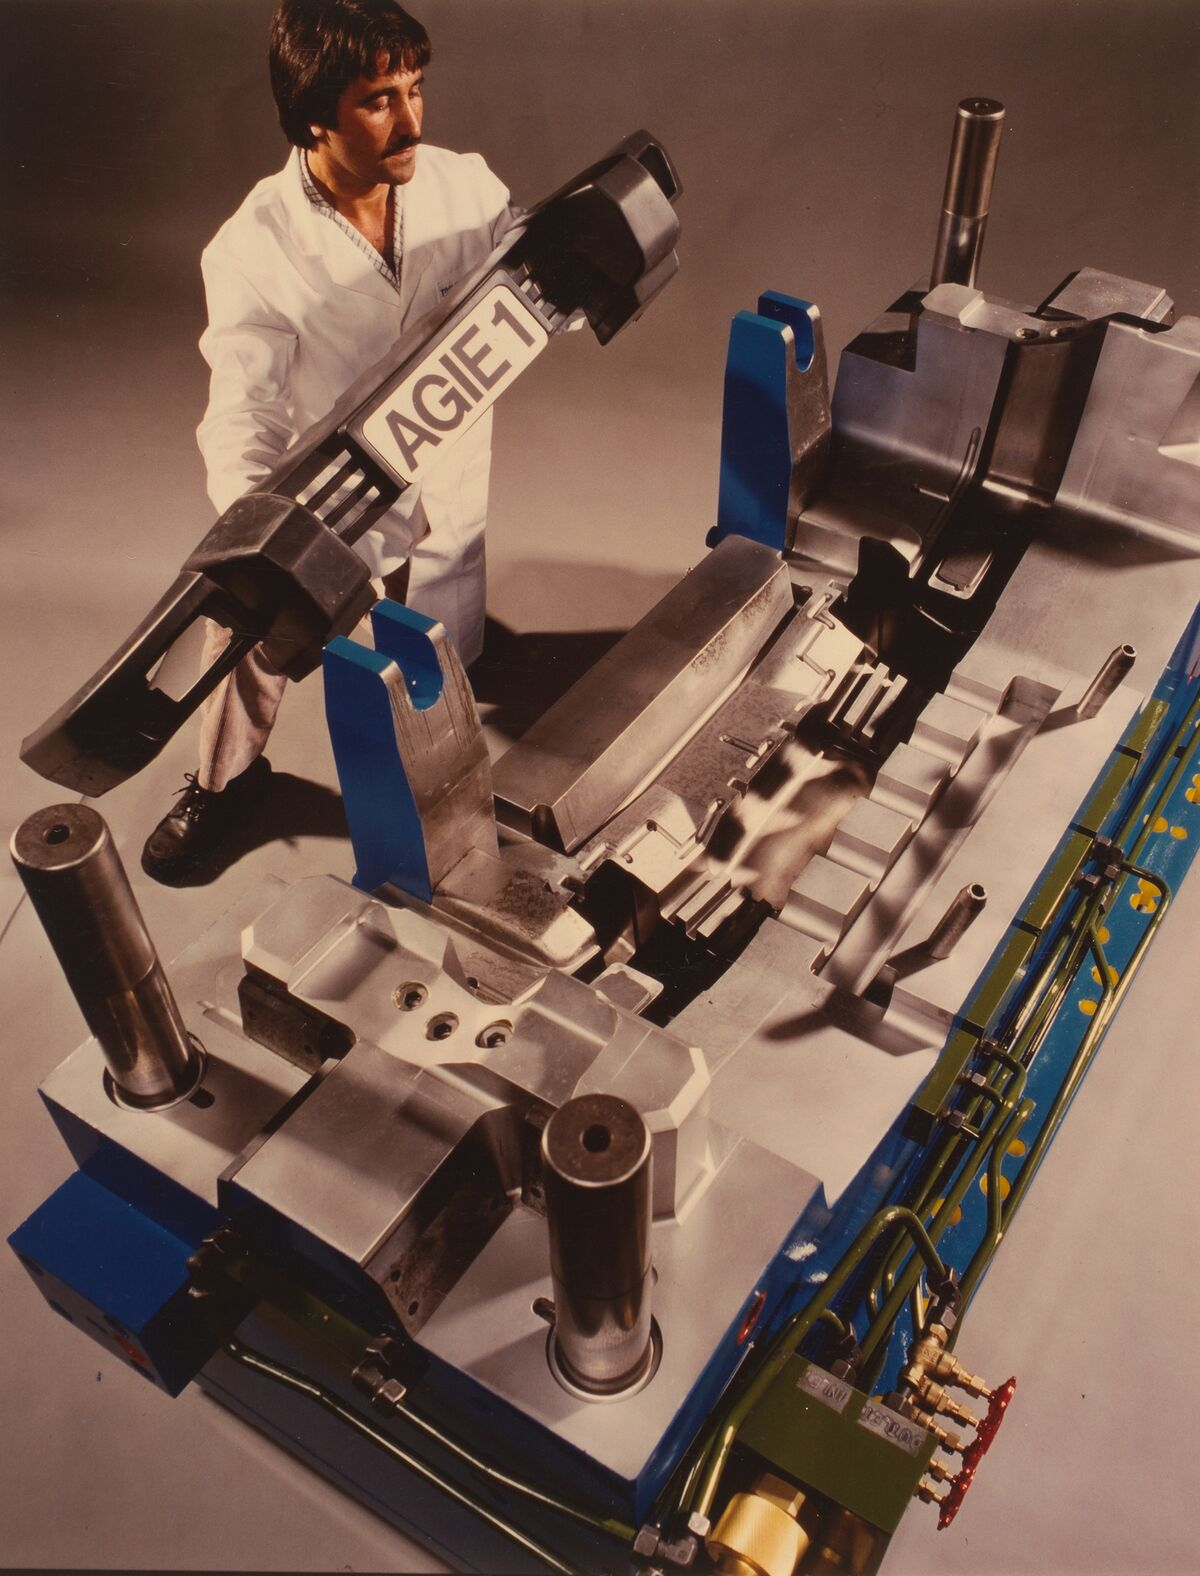 GFA 42/100272: Injection mold